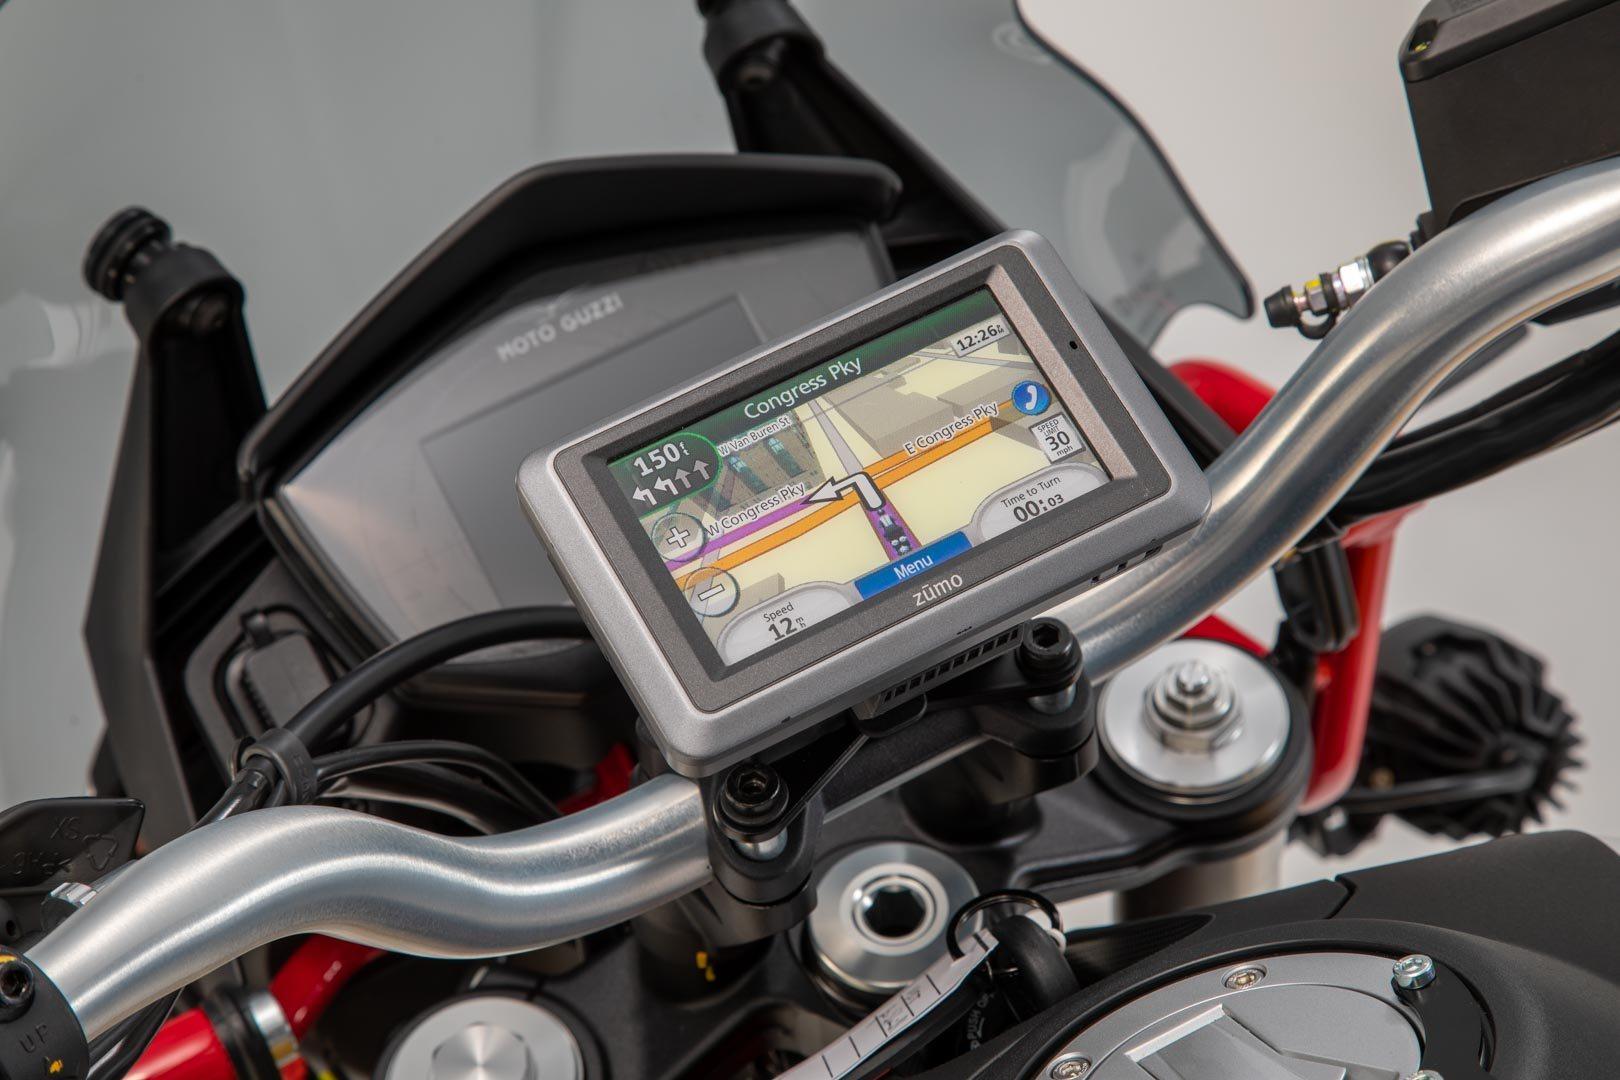 Eillybird Motorrad Nackenprotektor Nackenschutz Halsschutz Halskrause Nacken Protektor Neck Guard